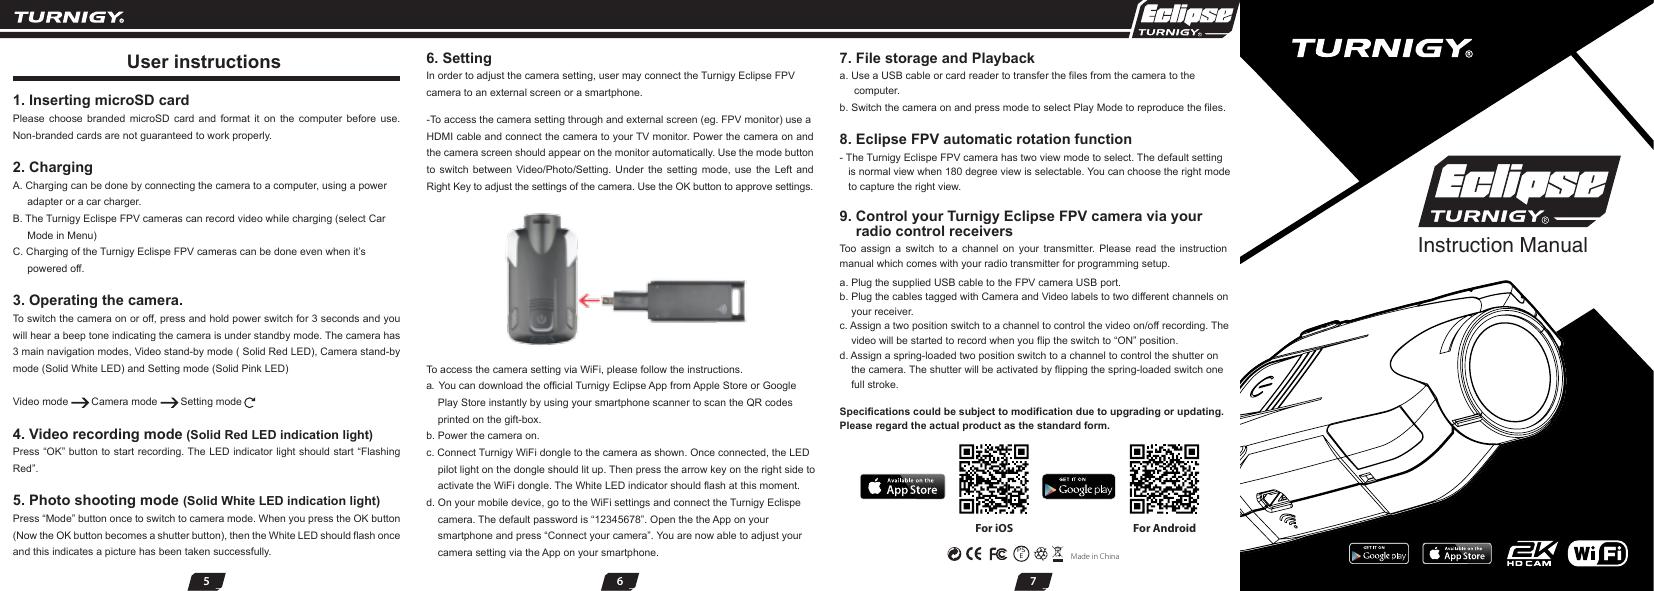 Turnigy Eclipse Action Camera Manual | manualzz com